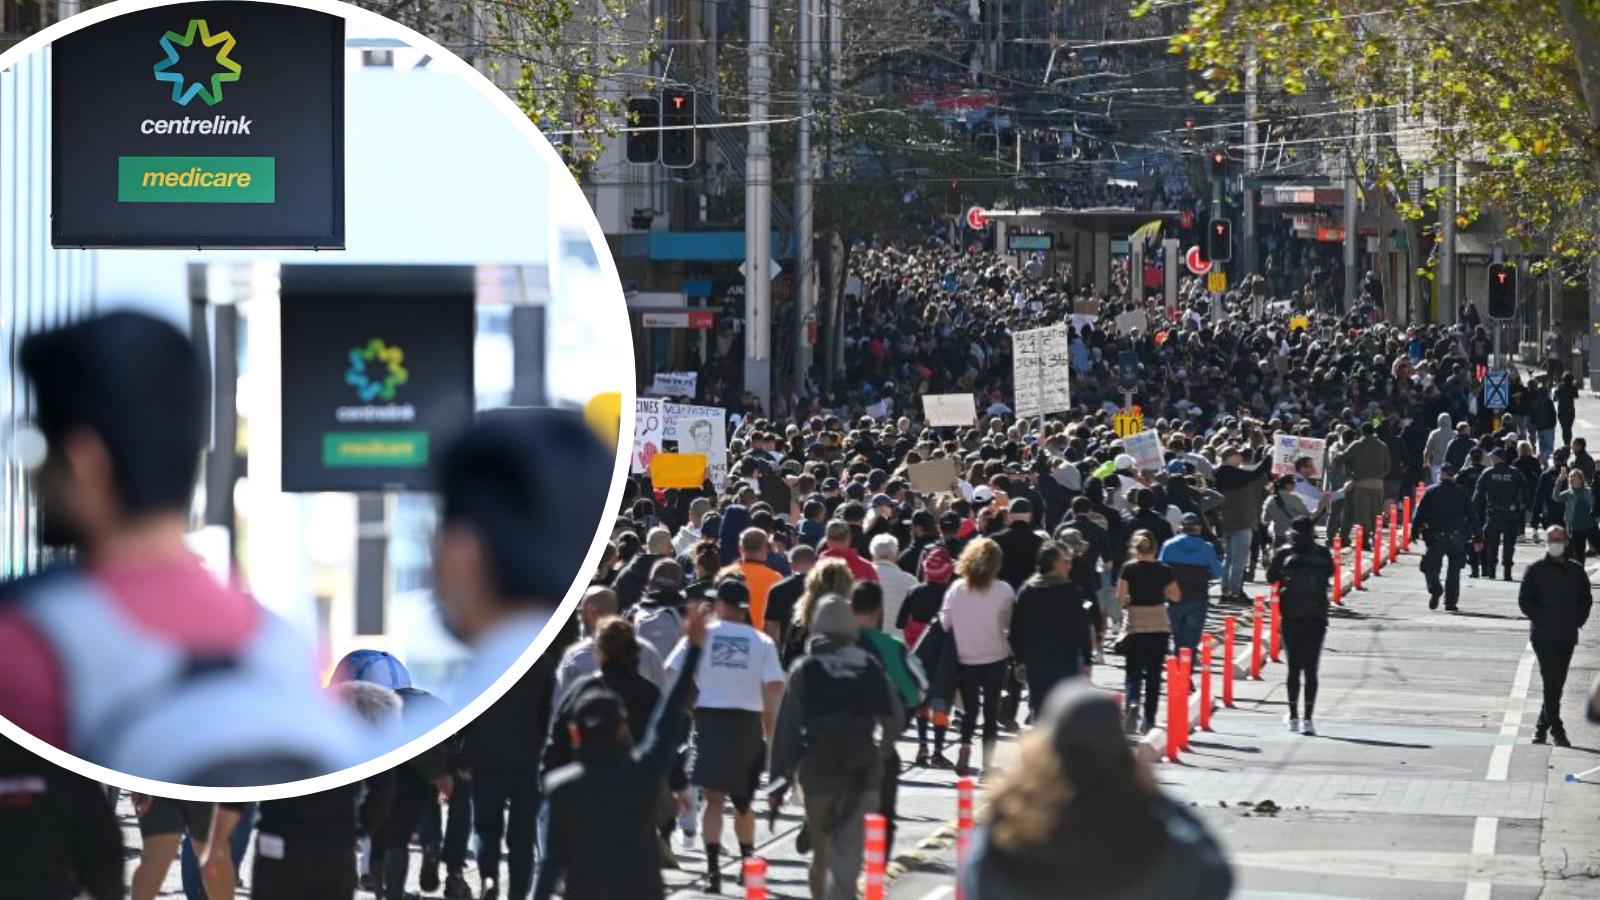 'Covidiots': Anti-lockdown protestors spark public outrage online